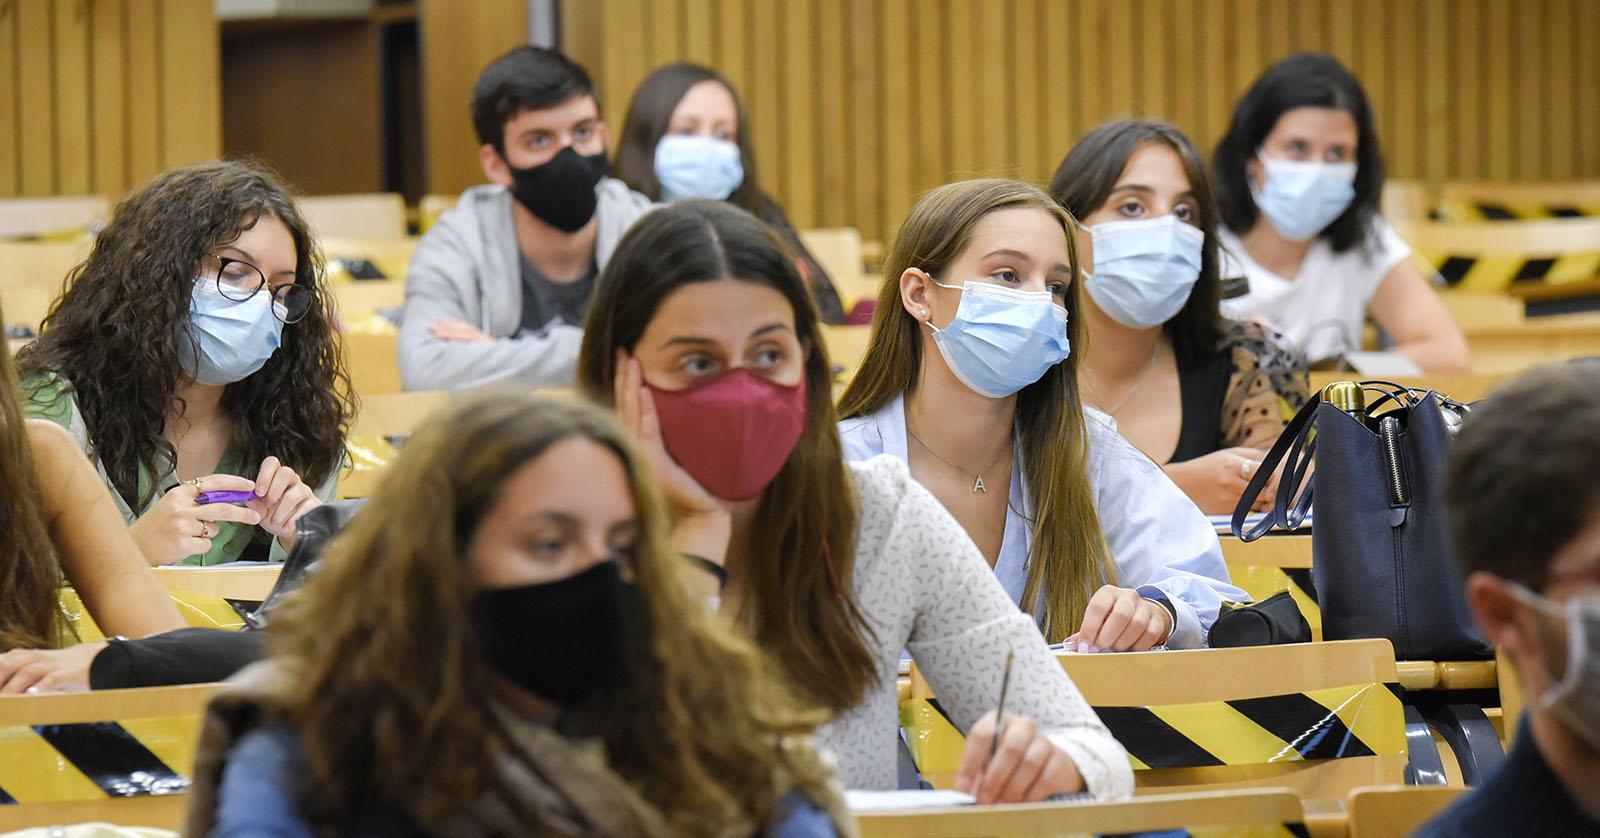 Revelados os primeiros resultados dos testes serológicos aos estudantes